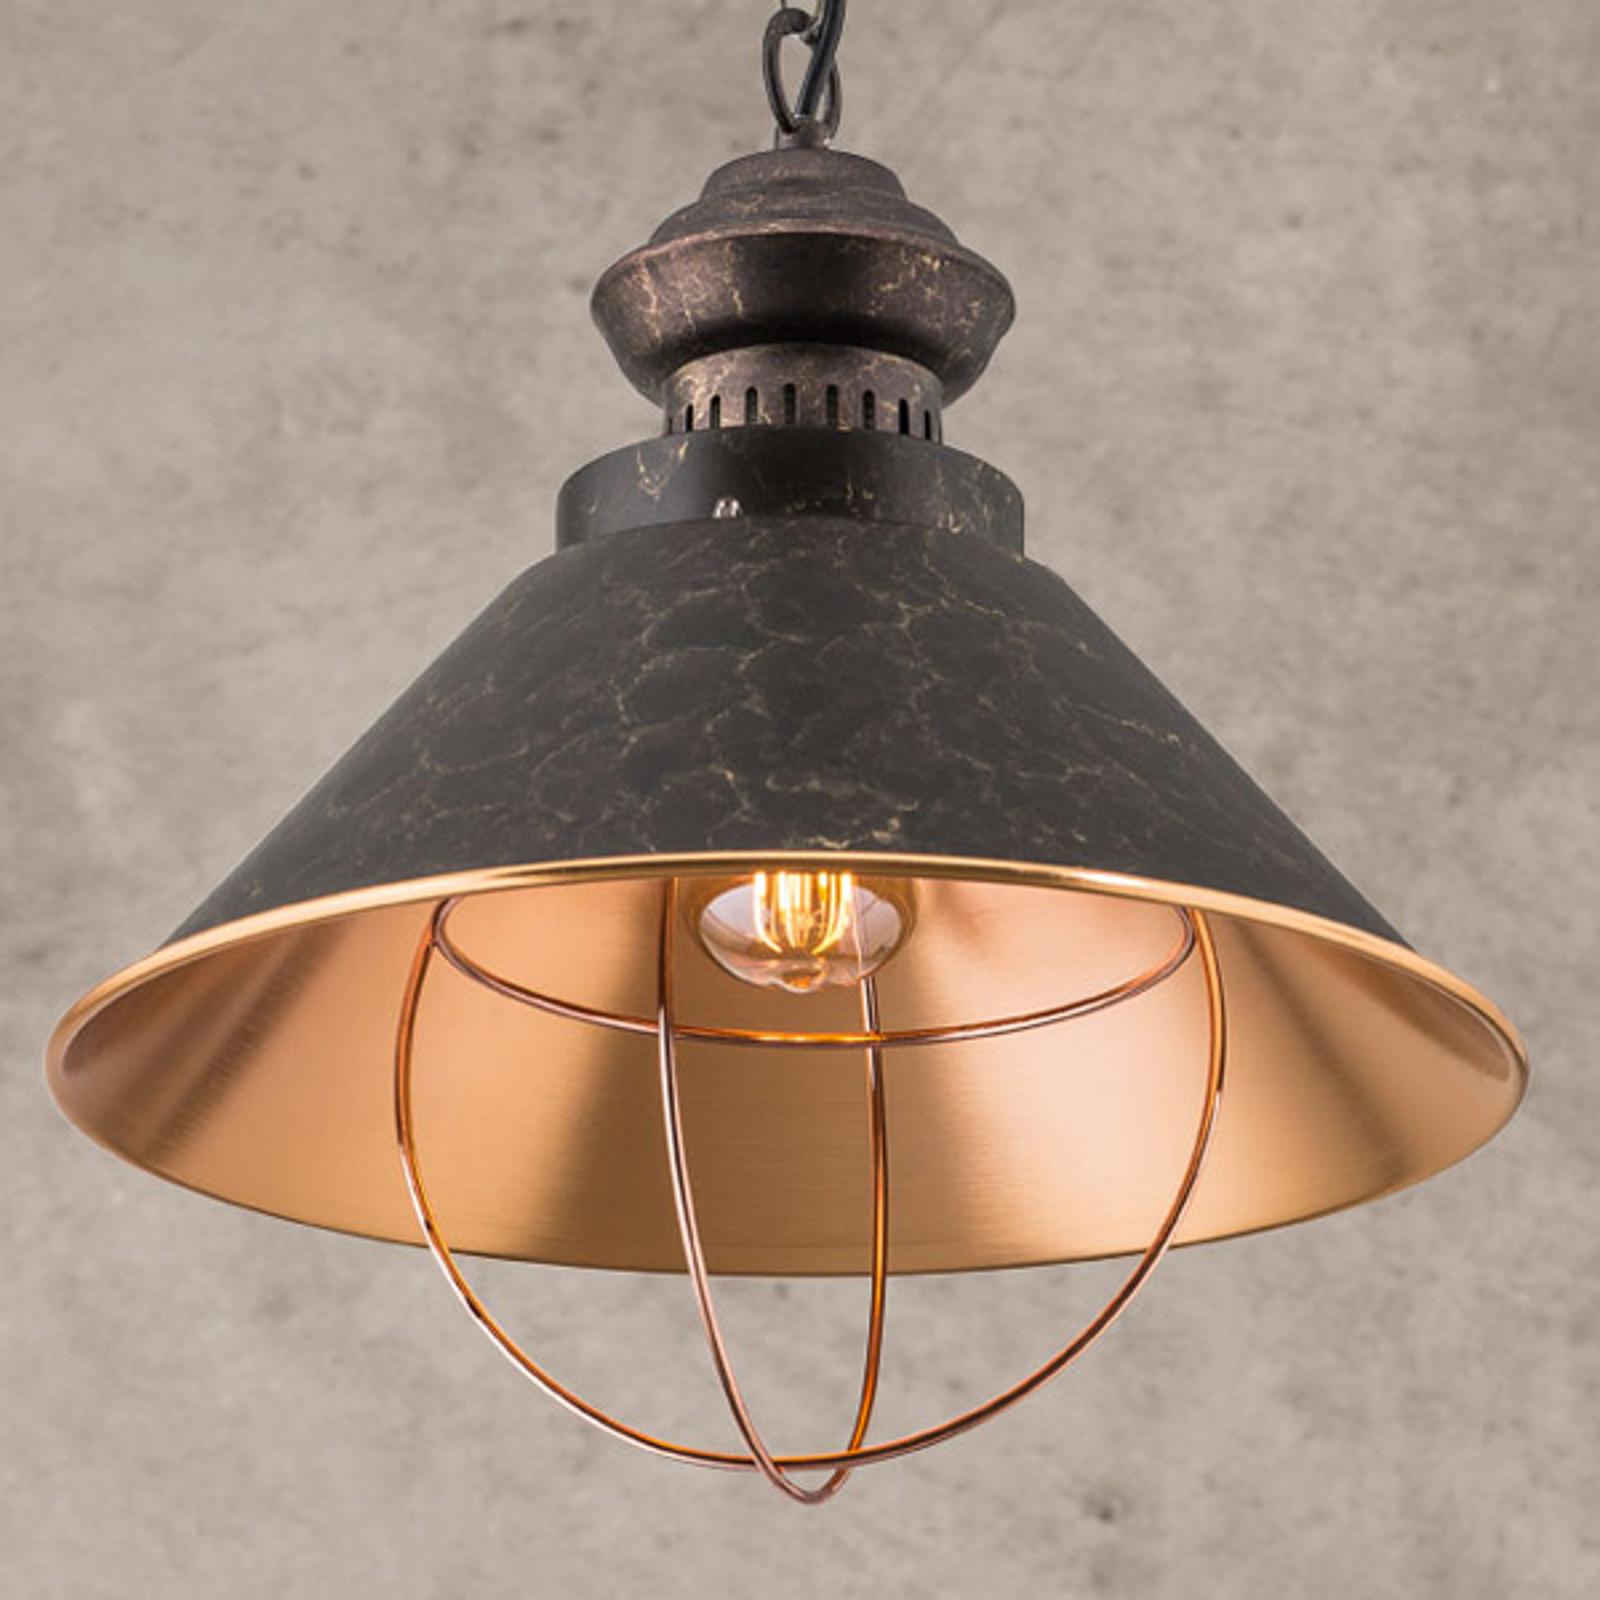 Suspension rustique Shanta, à une lampe